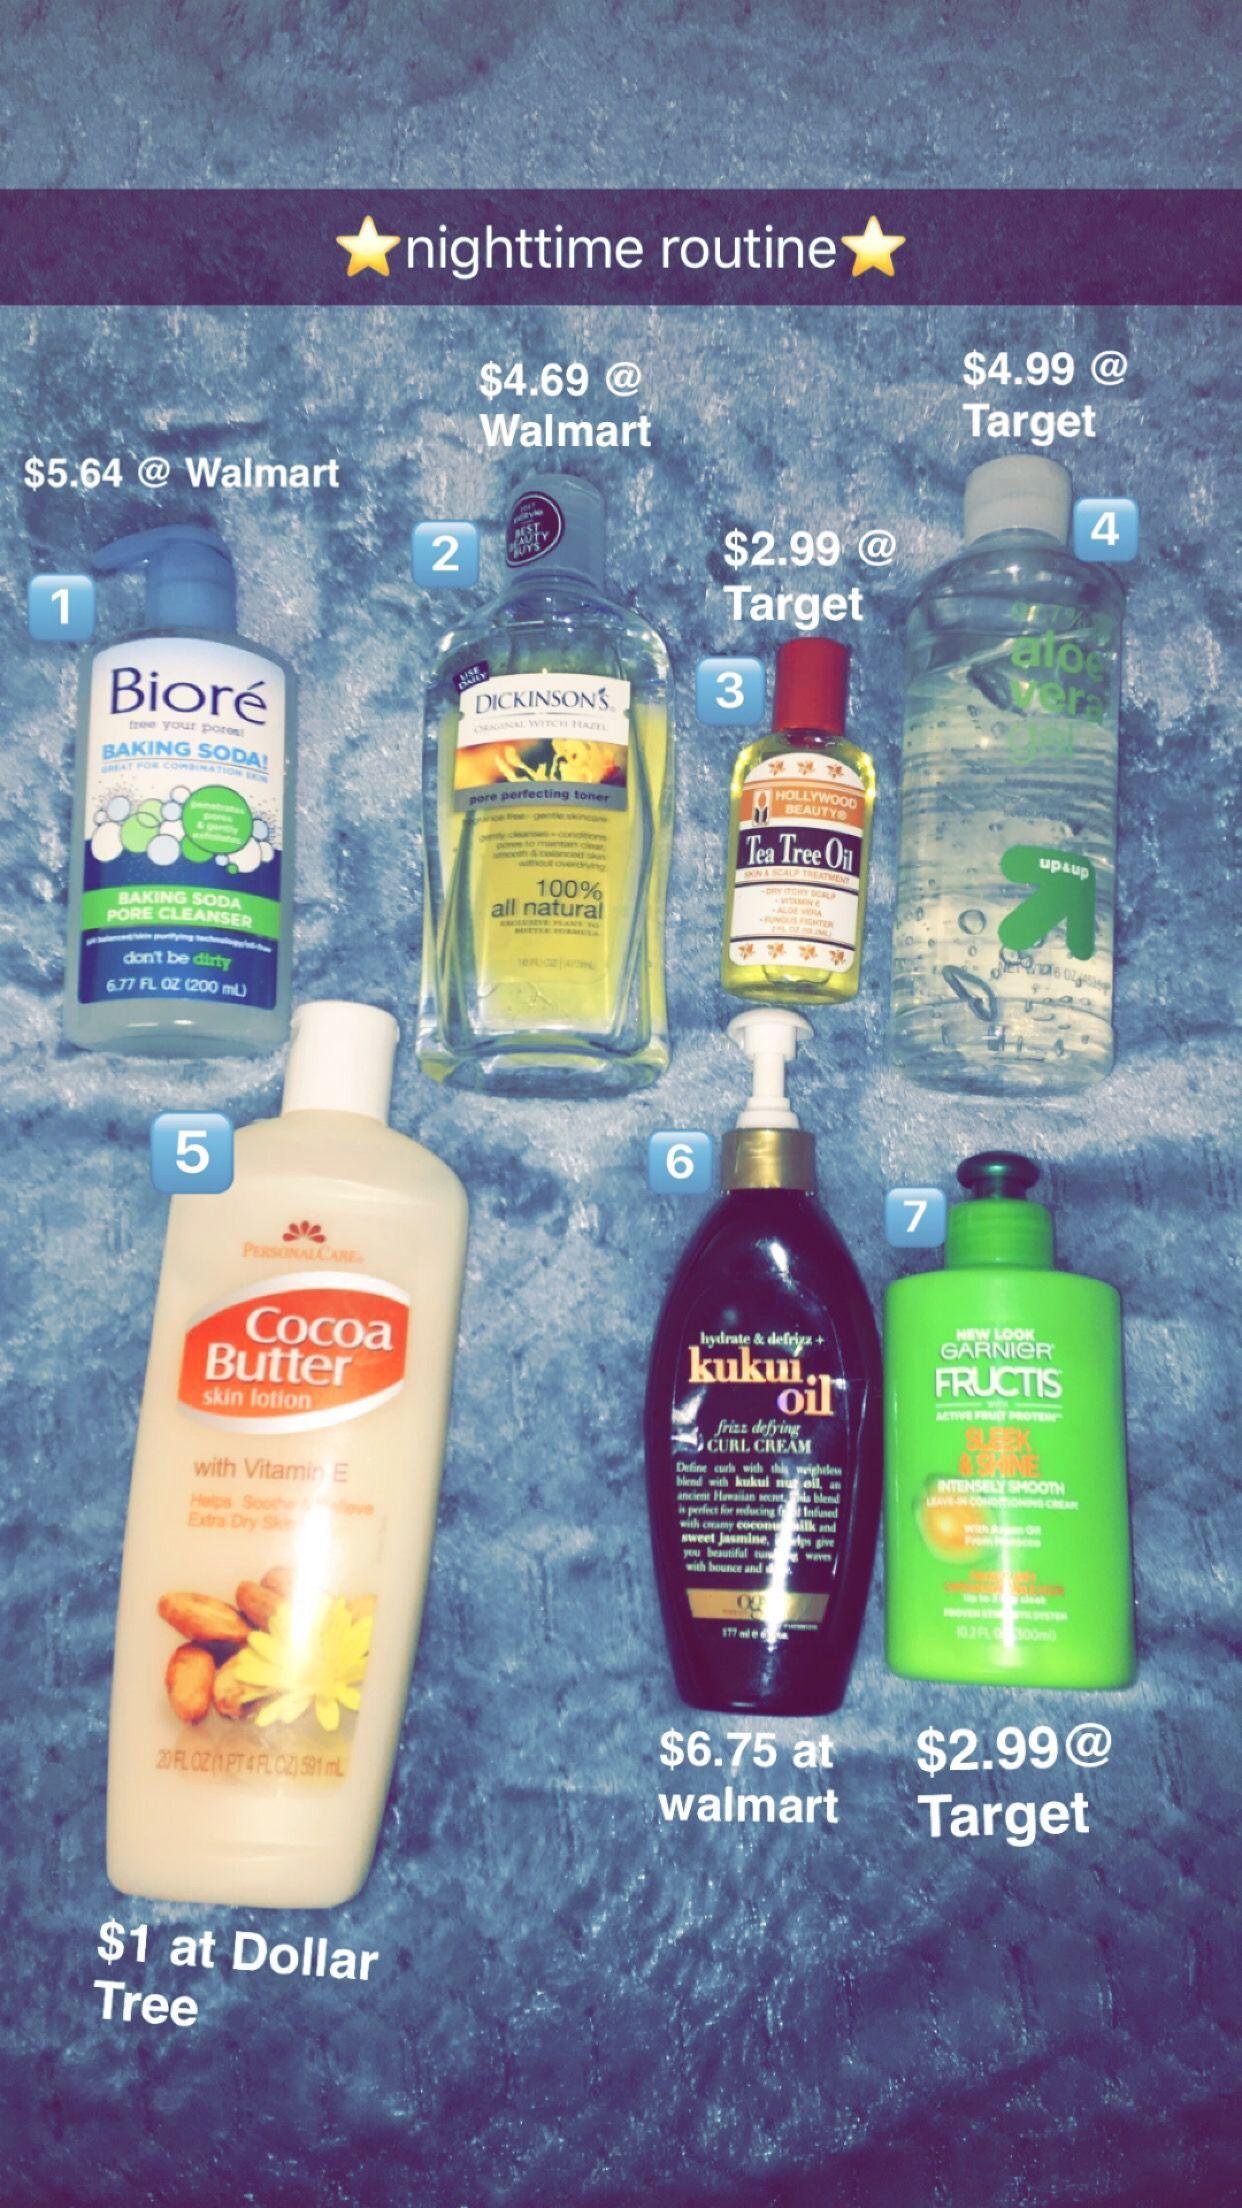 1. Biore baking soda wash - great for oily/combo skin 2